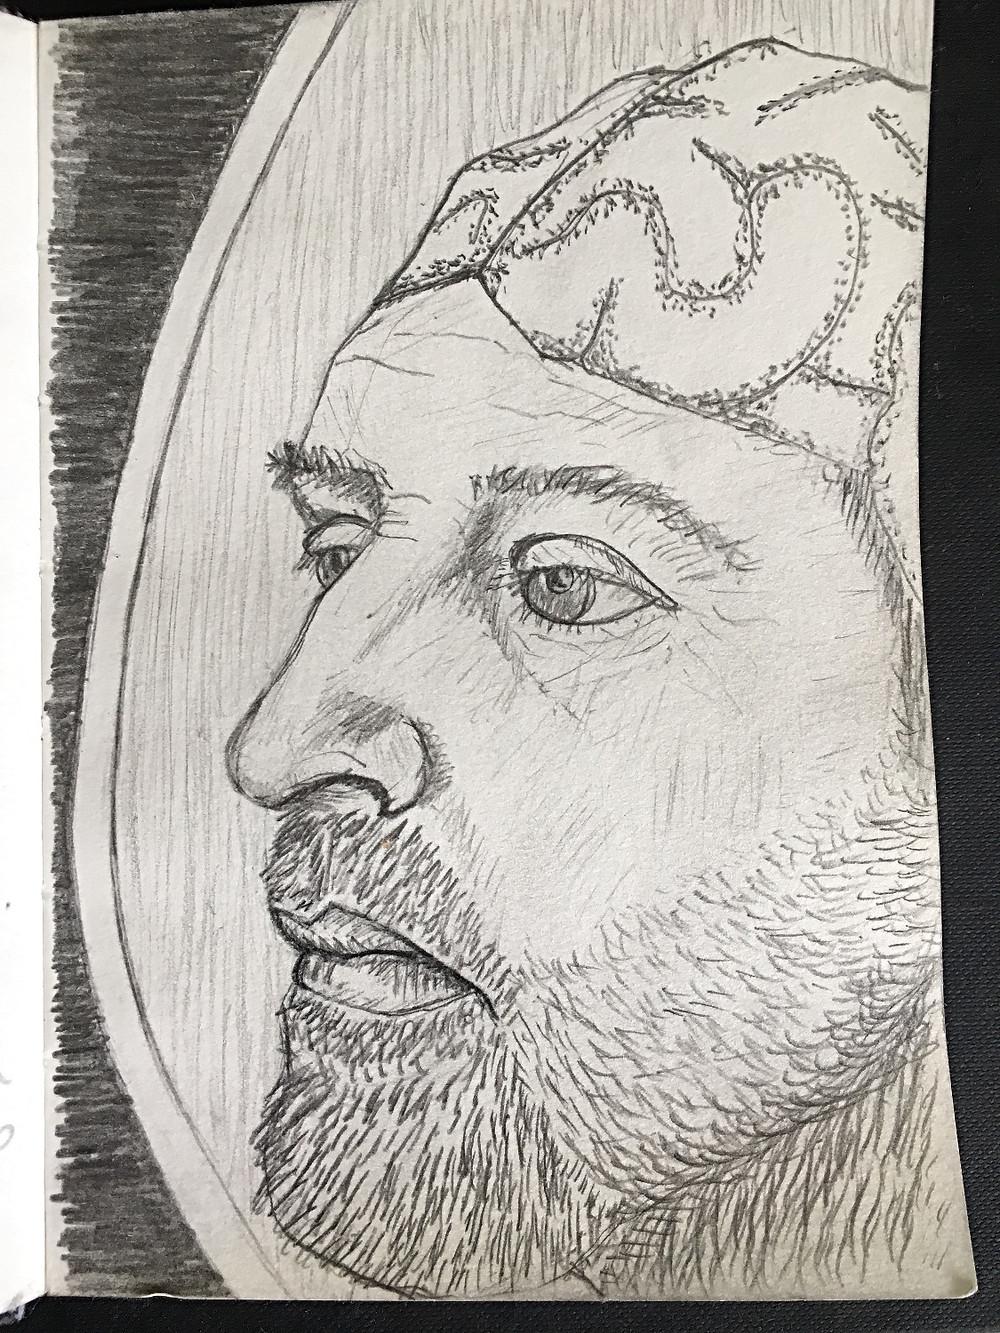 Mirror Self-Portrait with brain cap, 2018